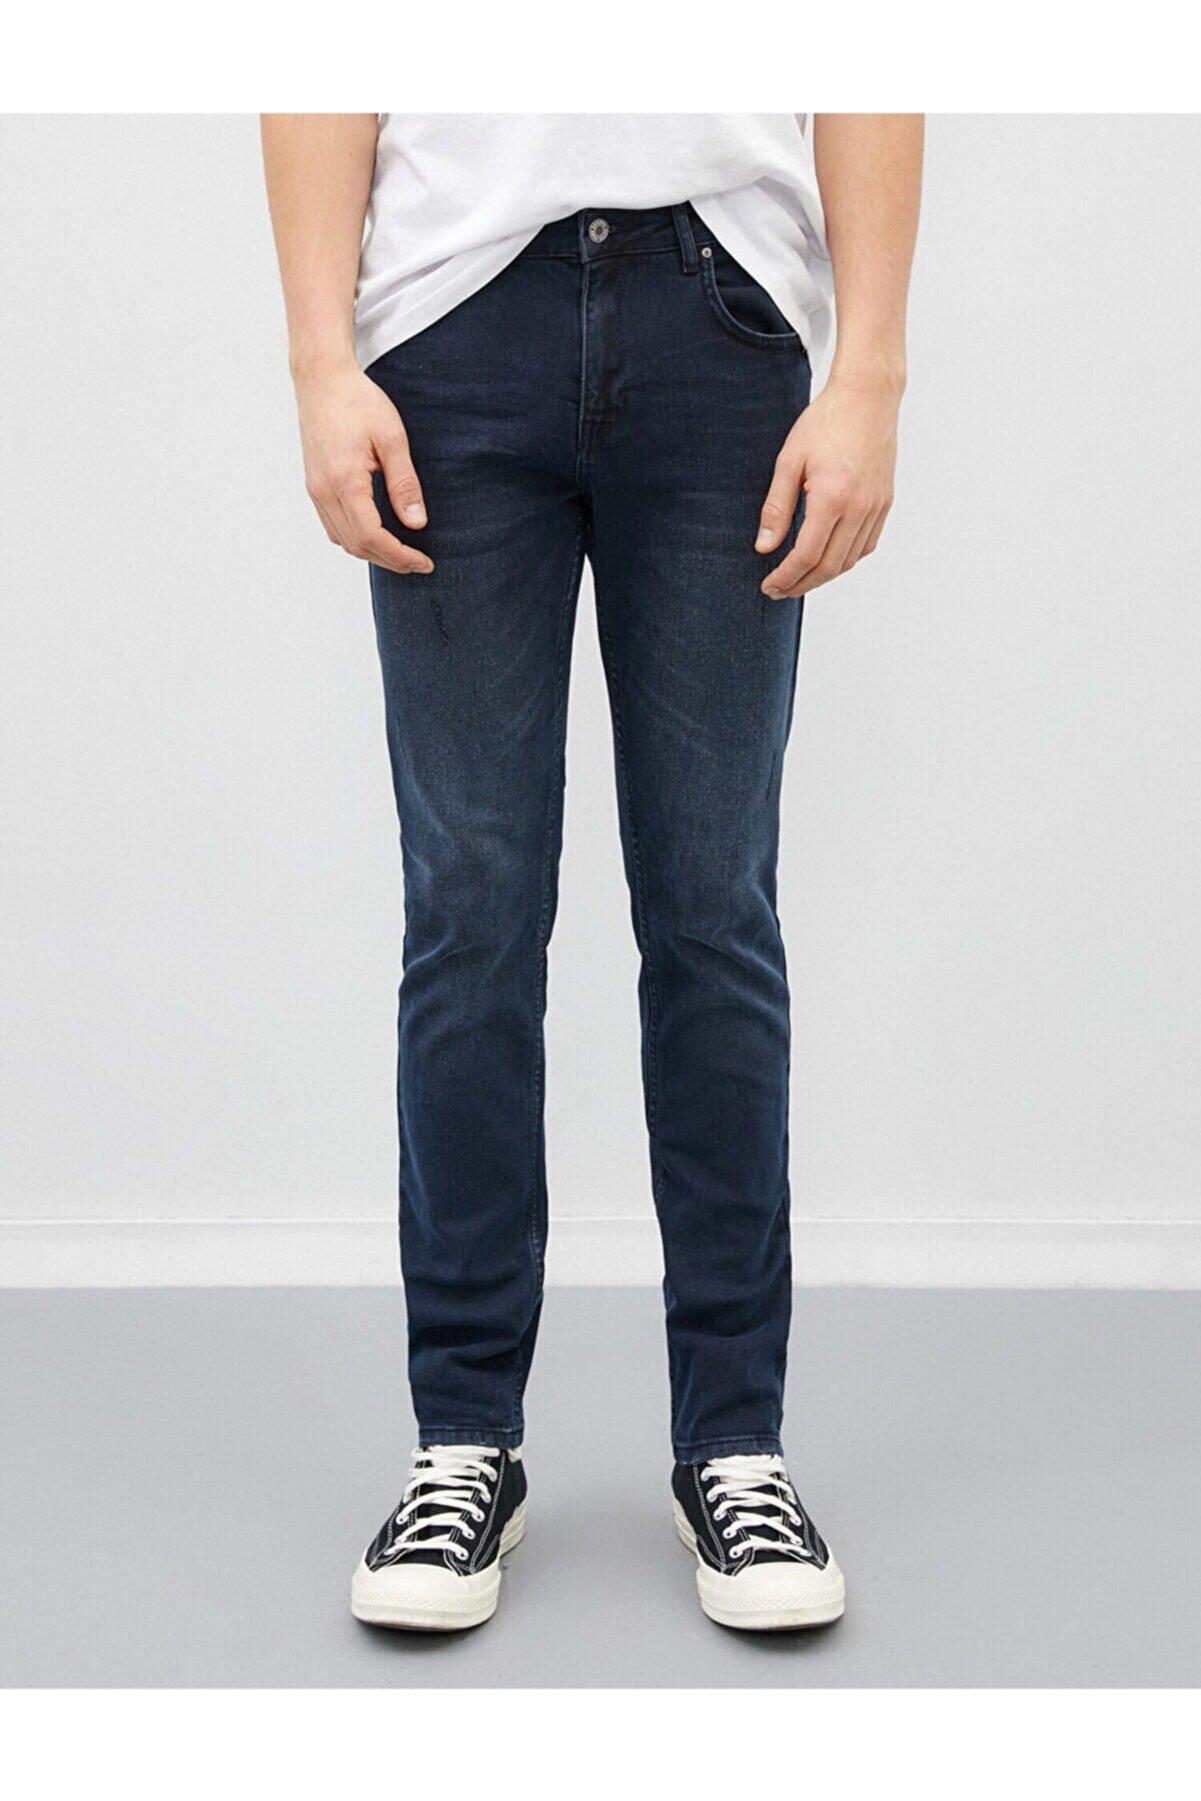 Koton Erkek Slim Fit Jean Pantolon Lacivert